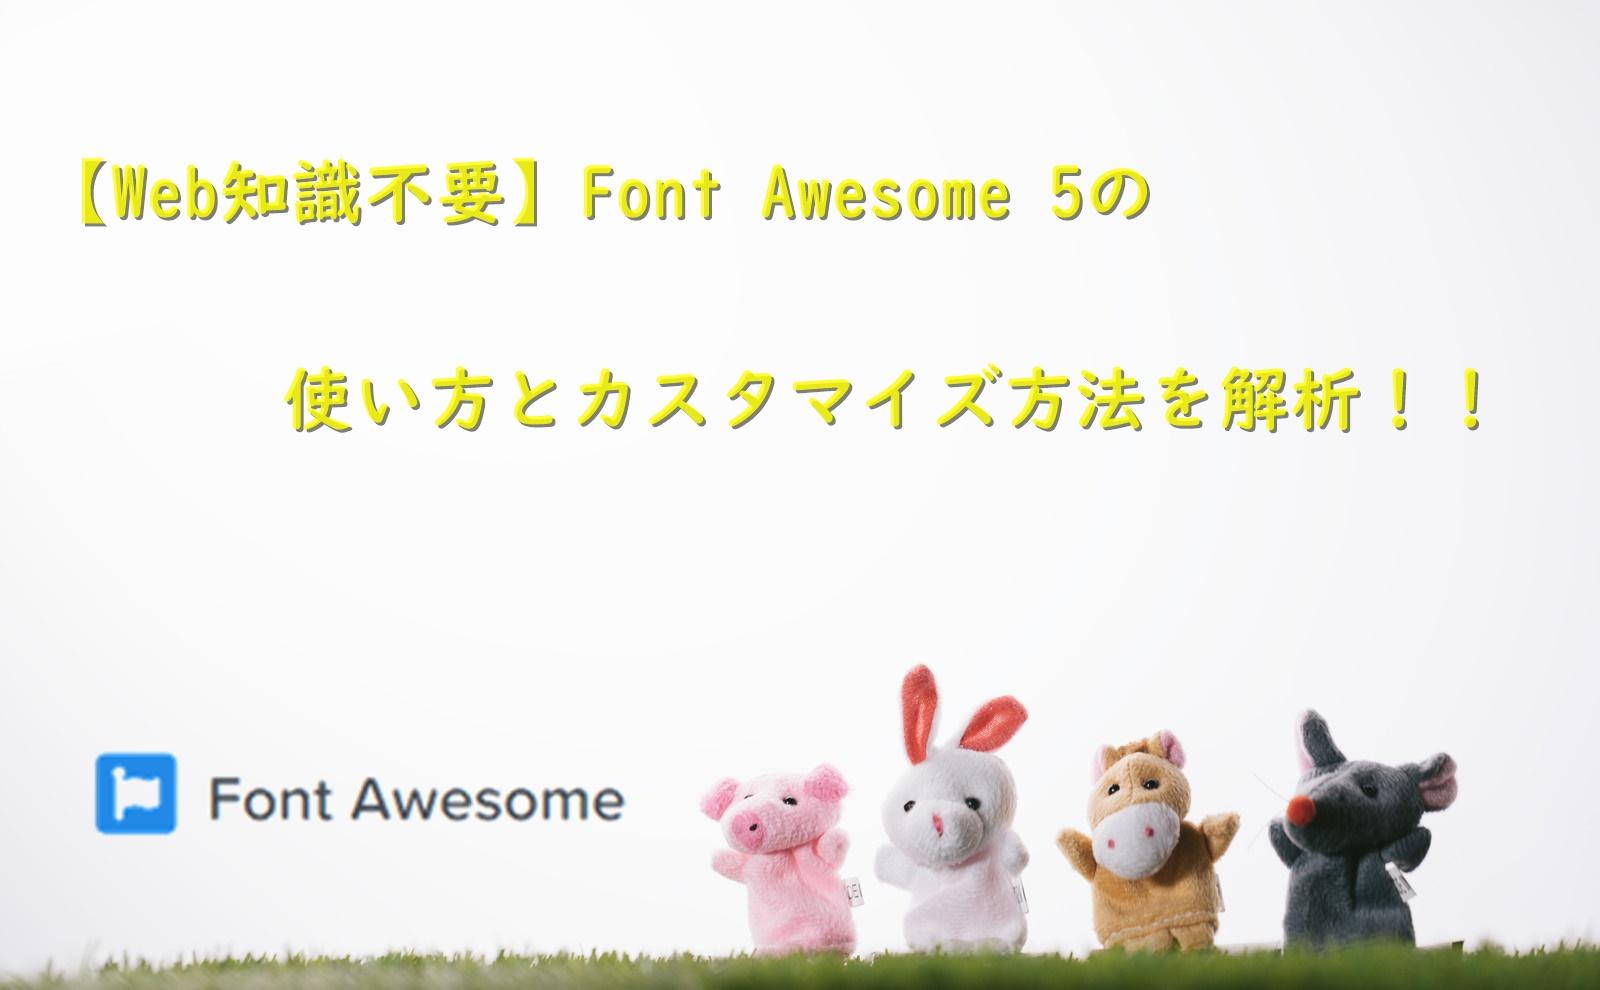 【Web知識不要】Font Awesome 5の使い方とカスタマイズ方法を解析!!のアイキャッチ画像